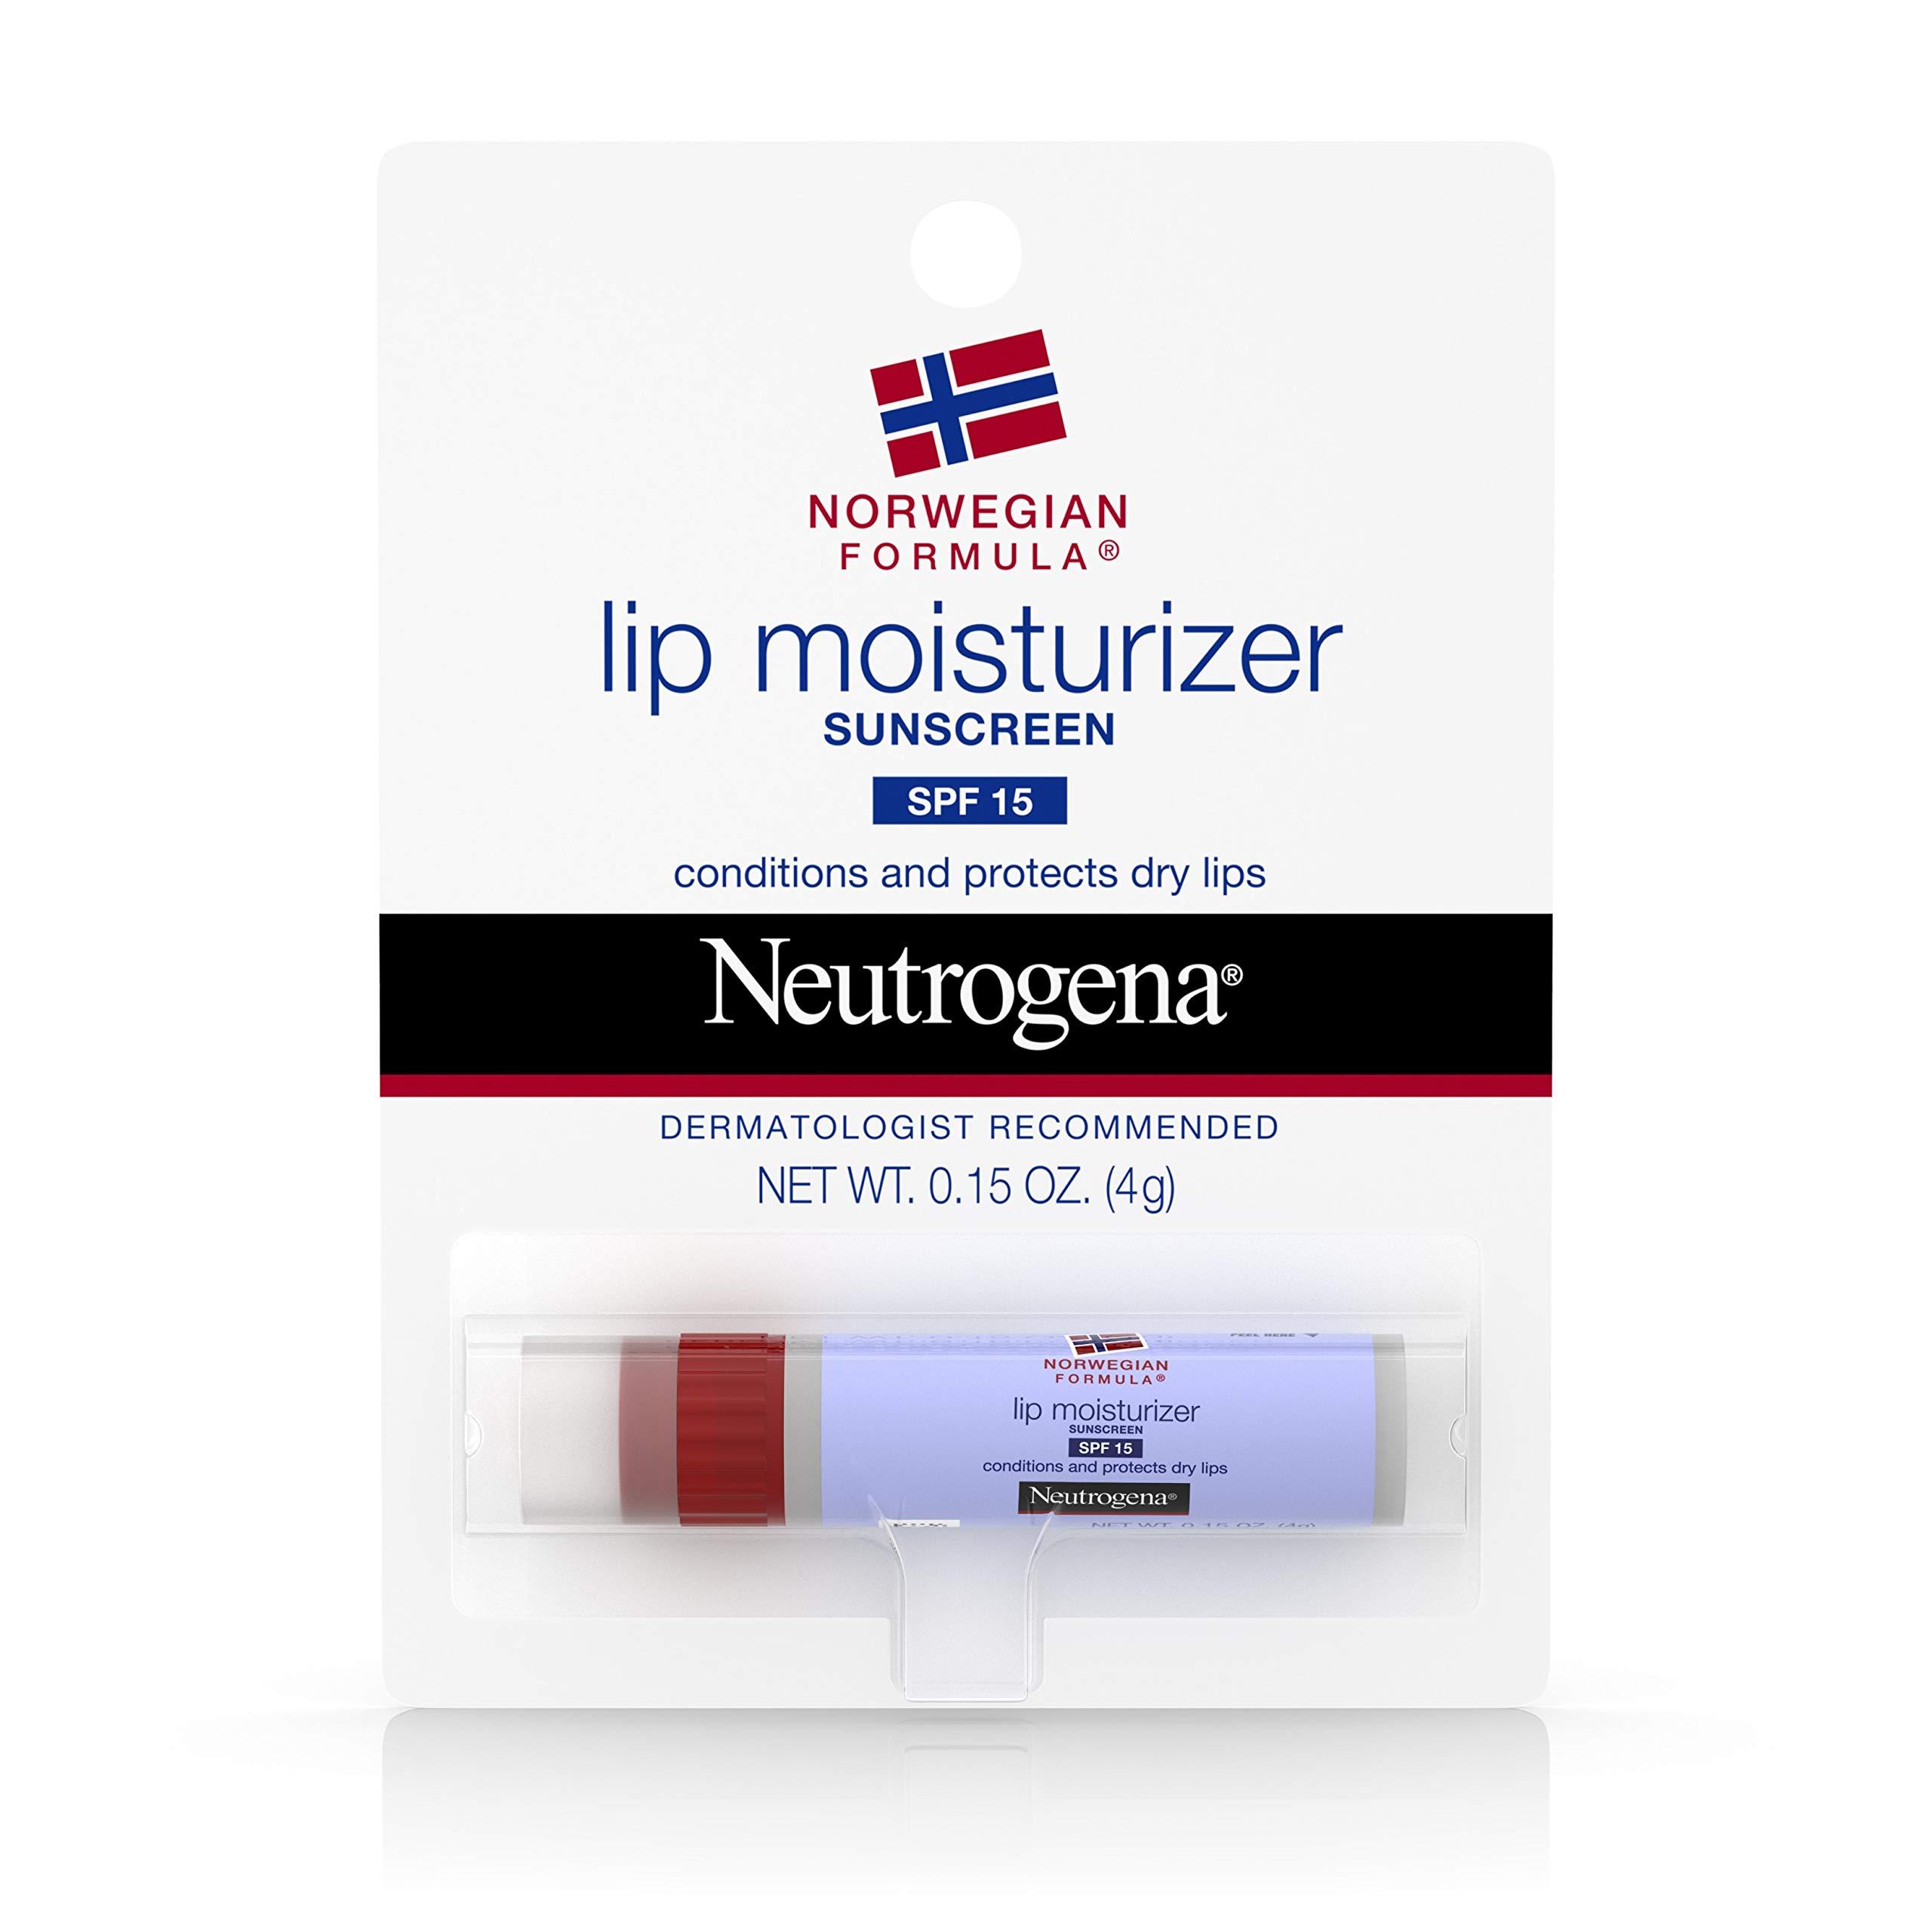 Neutrogena Norwegian Formula Lip Moisturizer With Sunscreen, Spf 15,.15 Oz. (Pack of 3) by Neutrogena